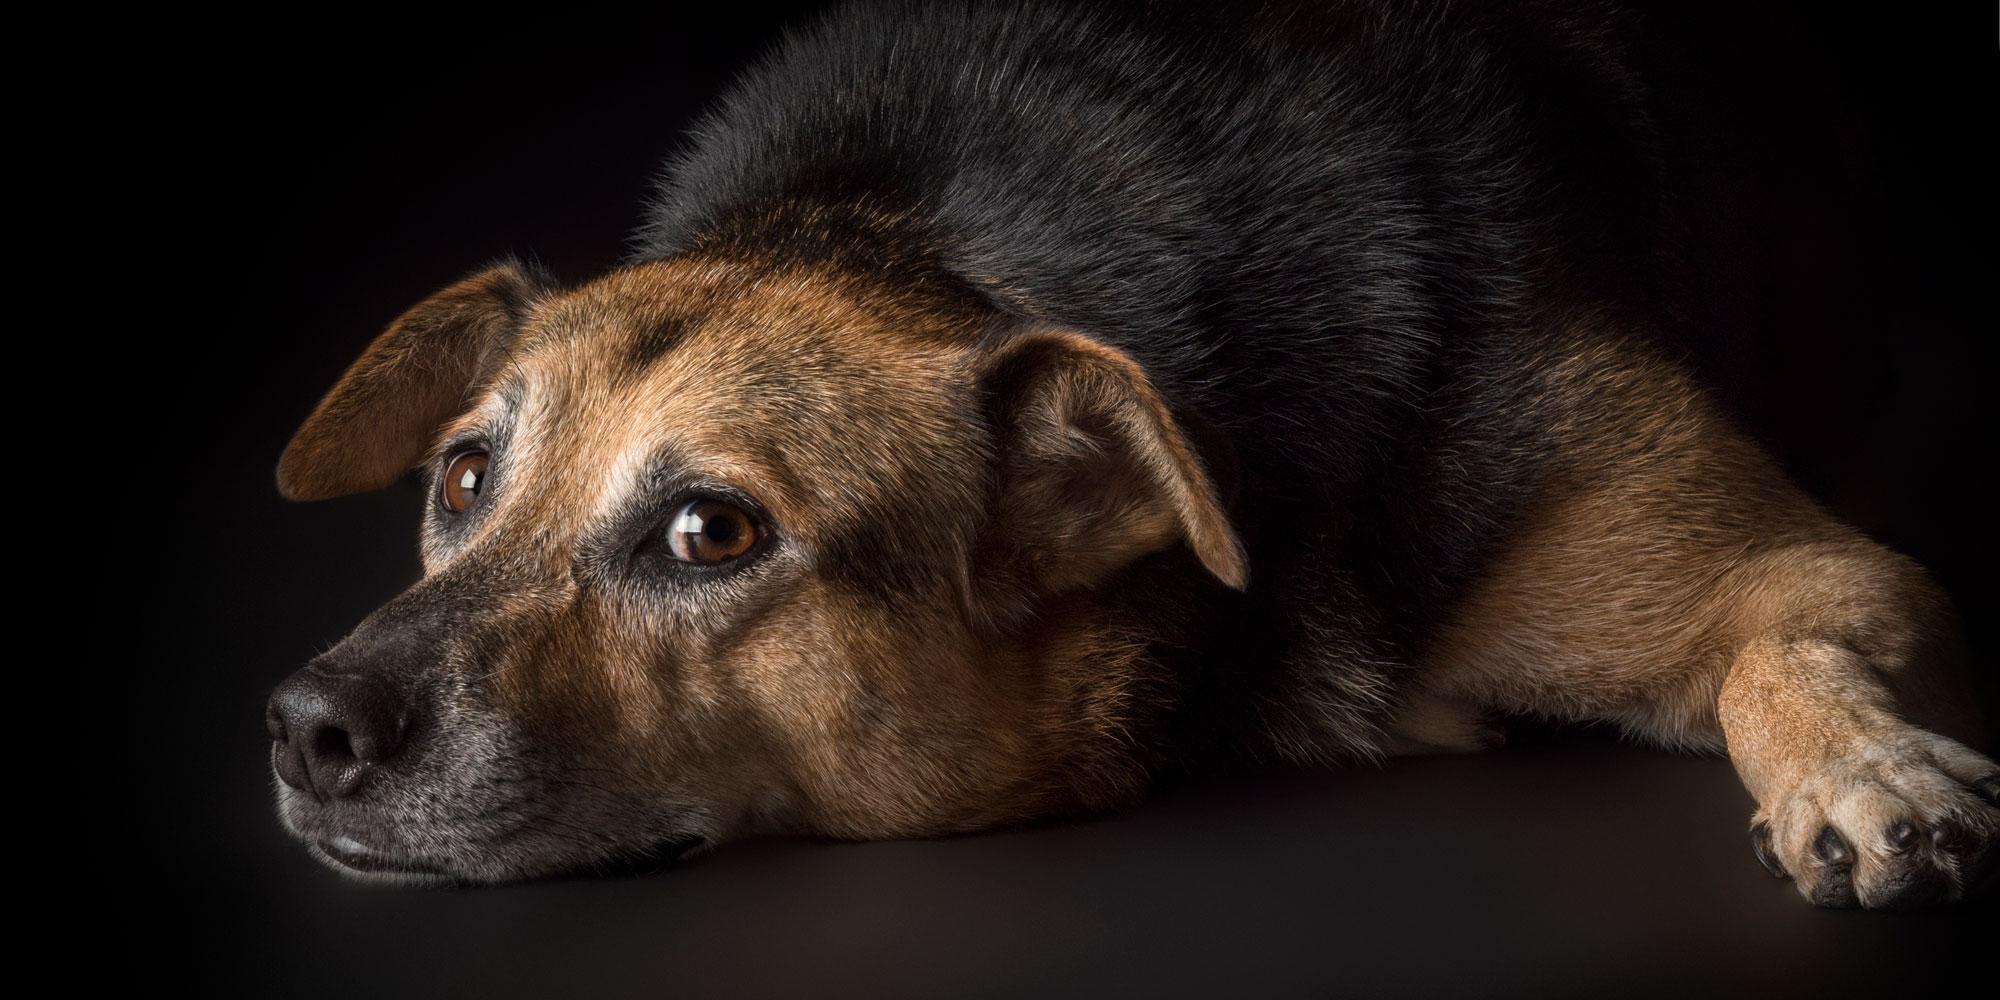 sweet faced australian cattle dog cross with head down